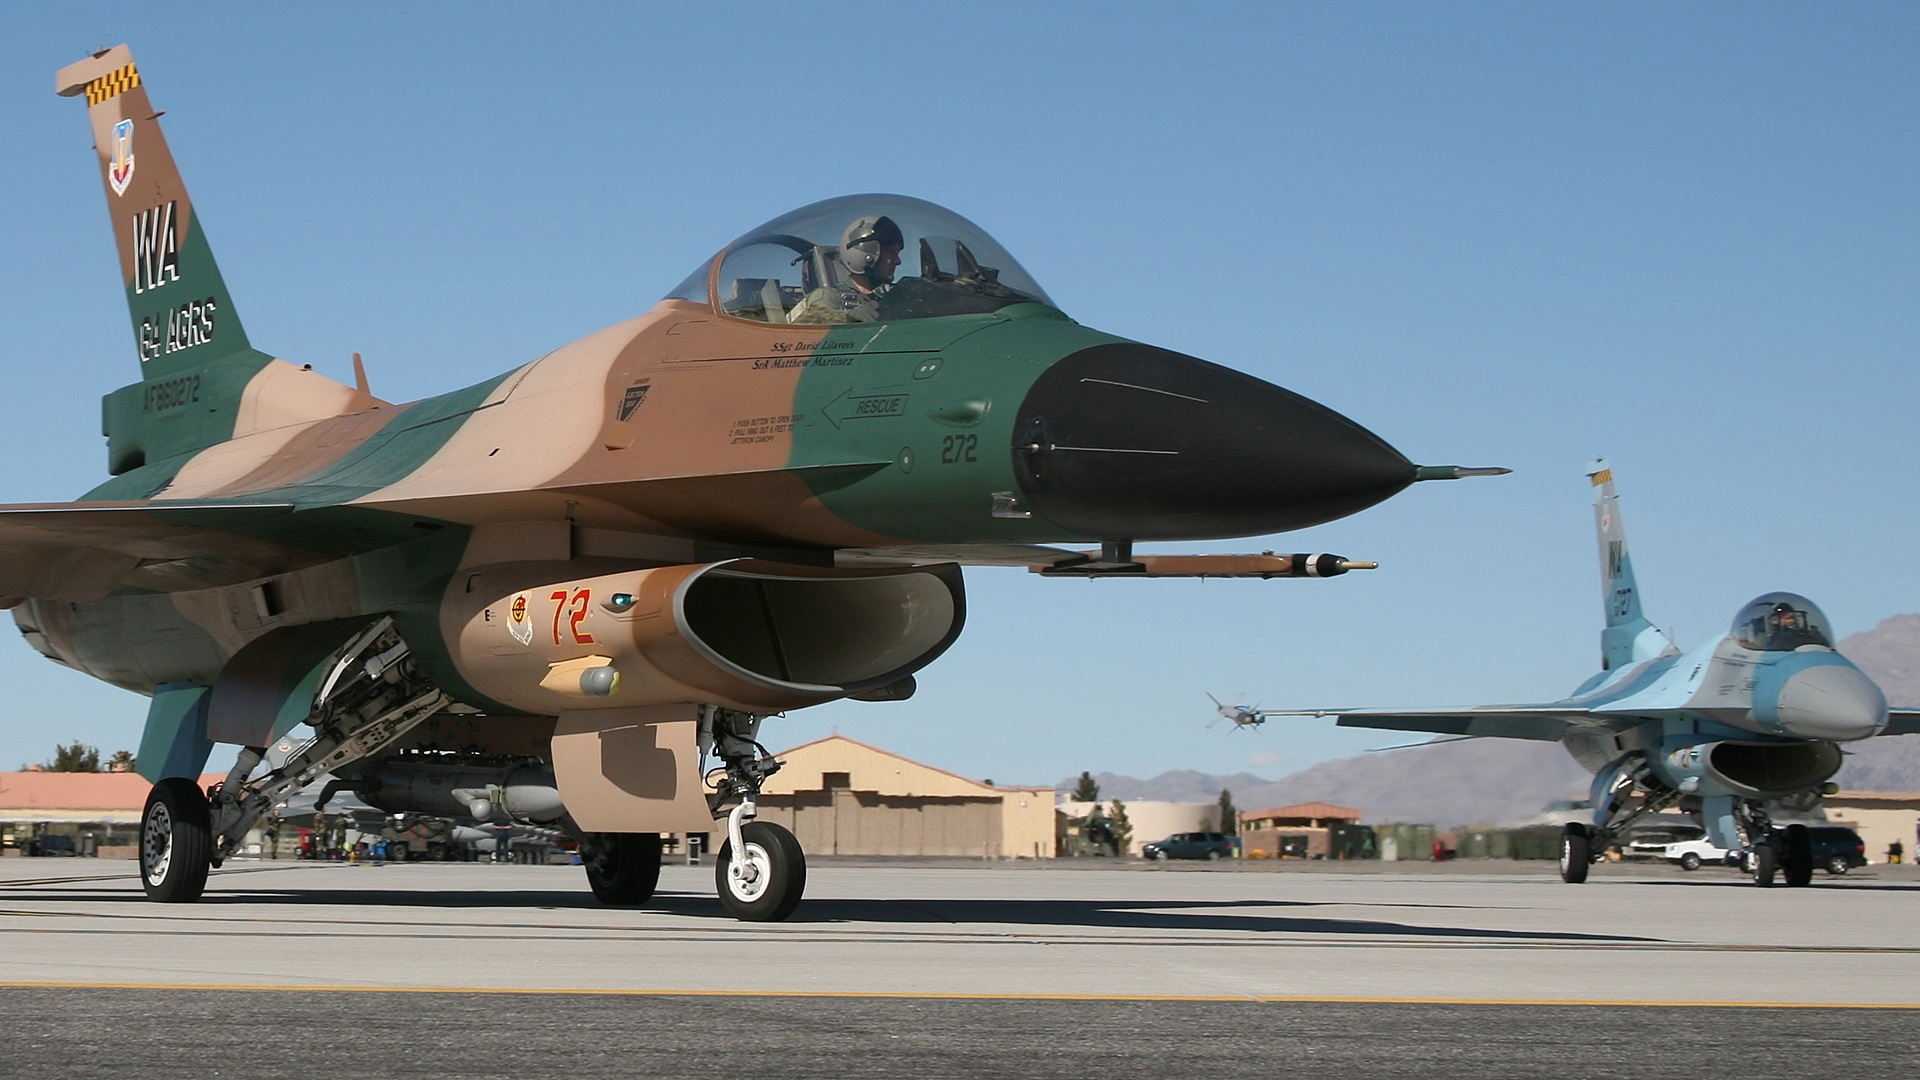 American Jet Fighter Wallpaper